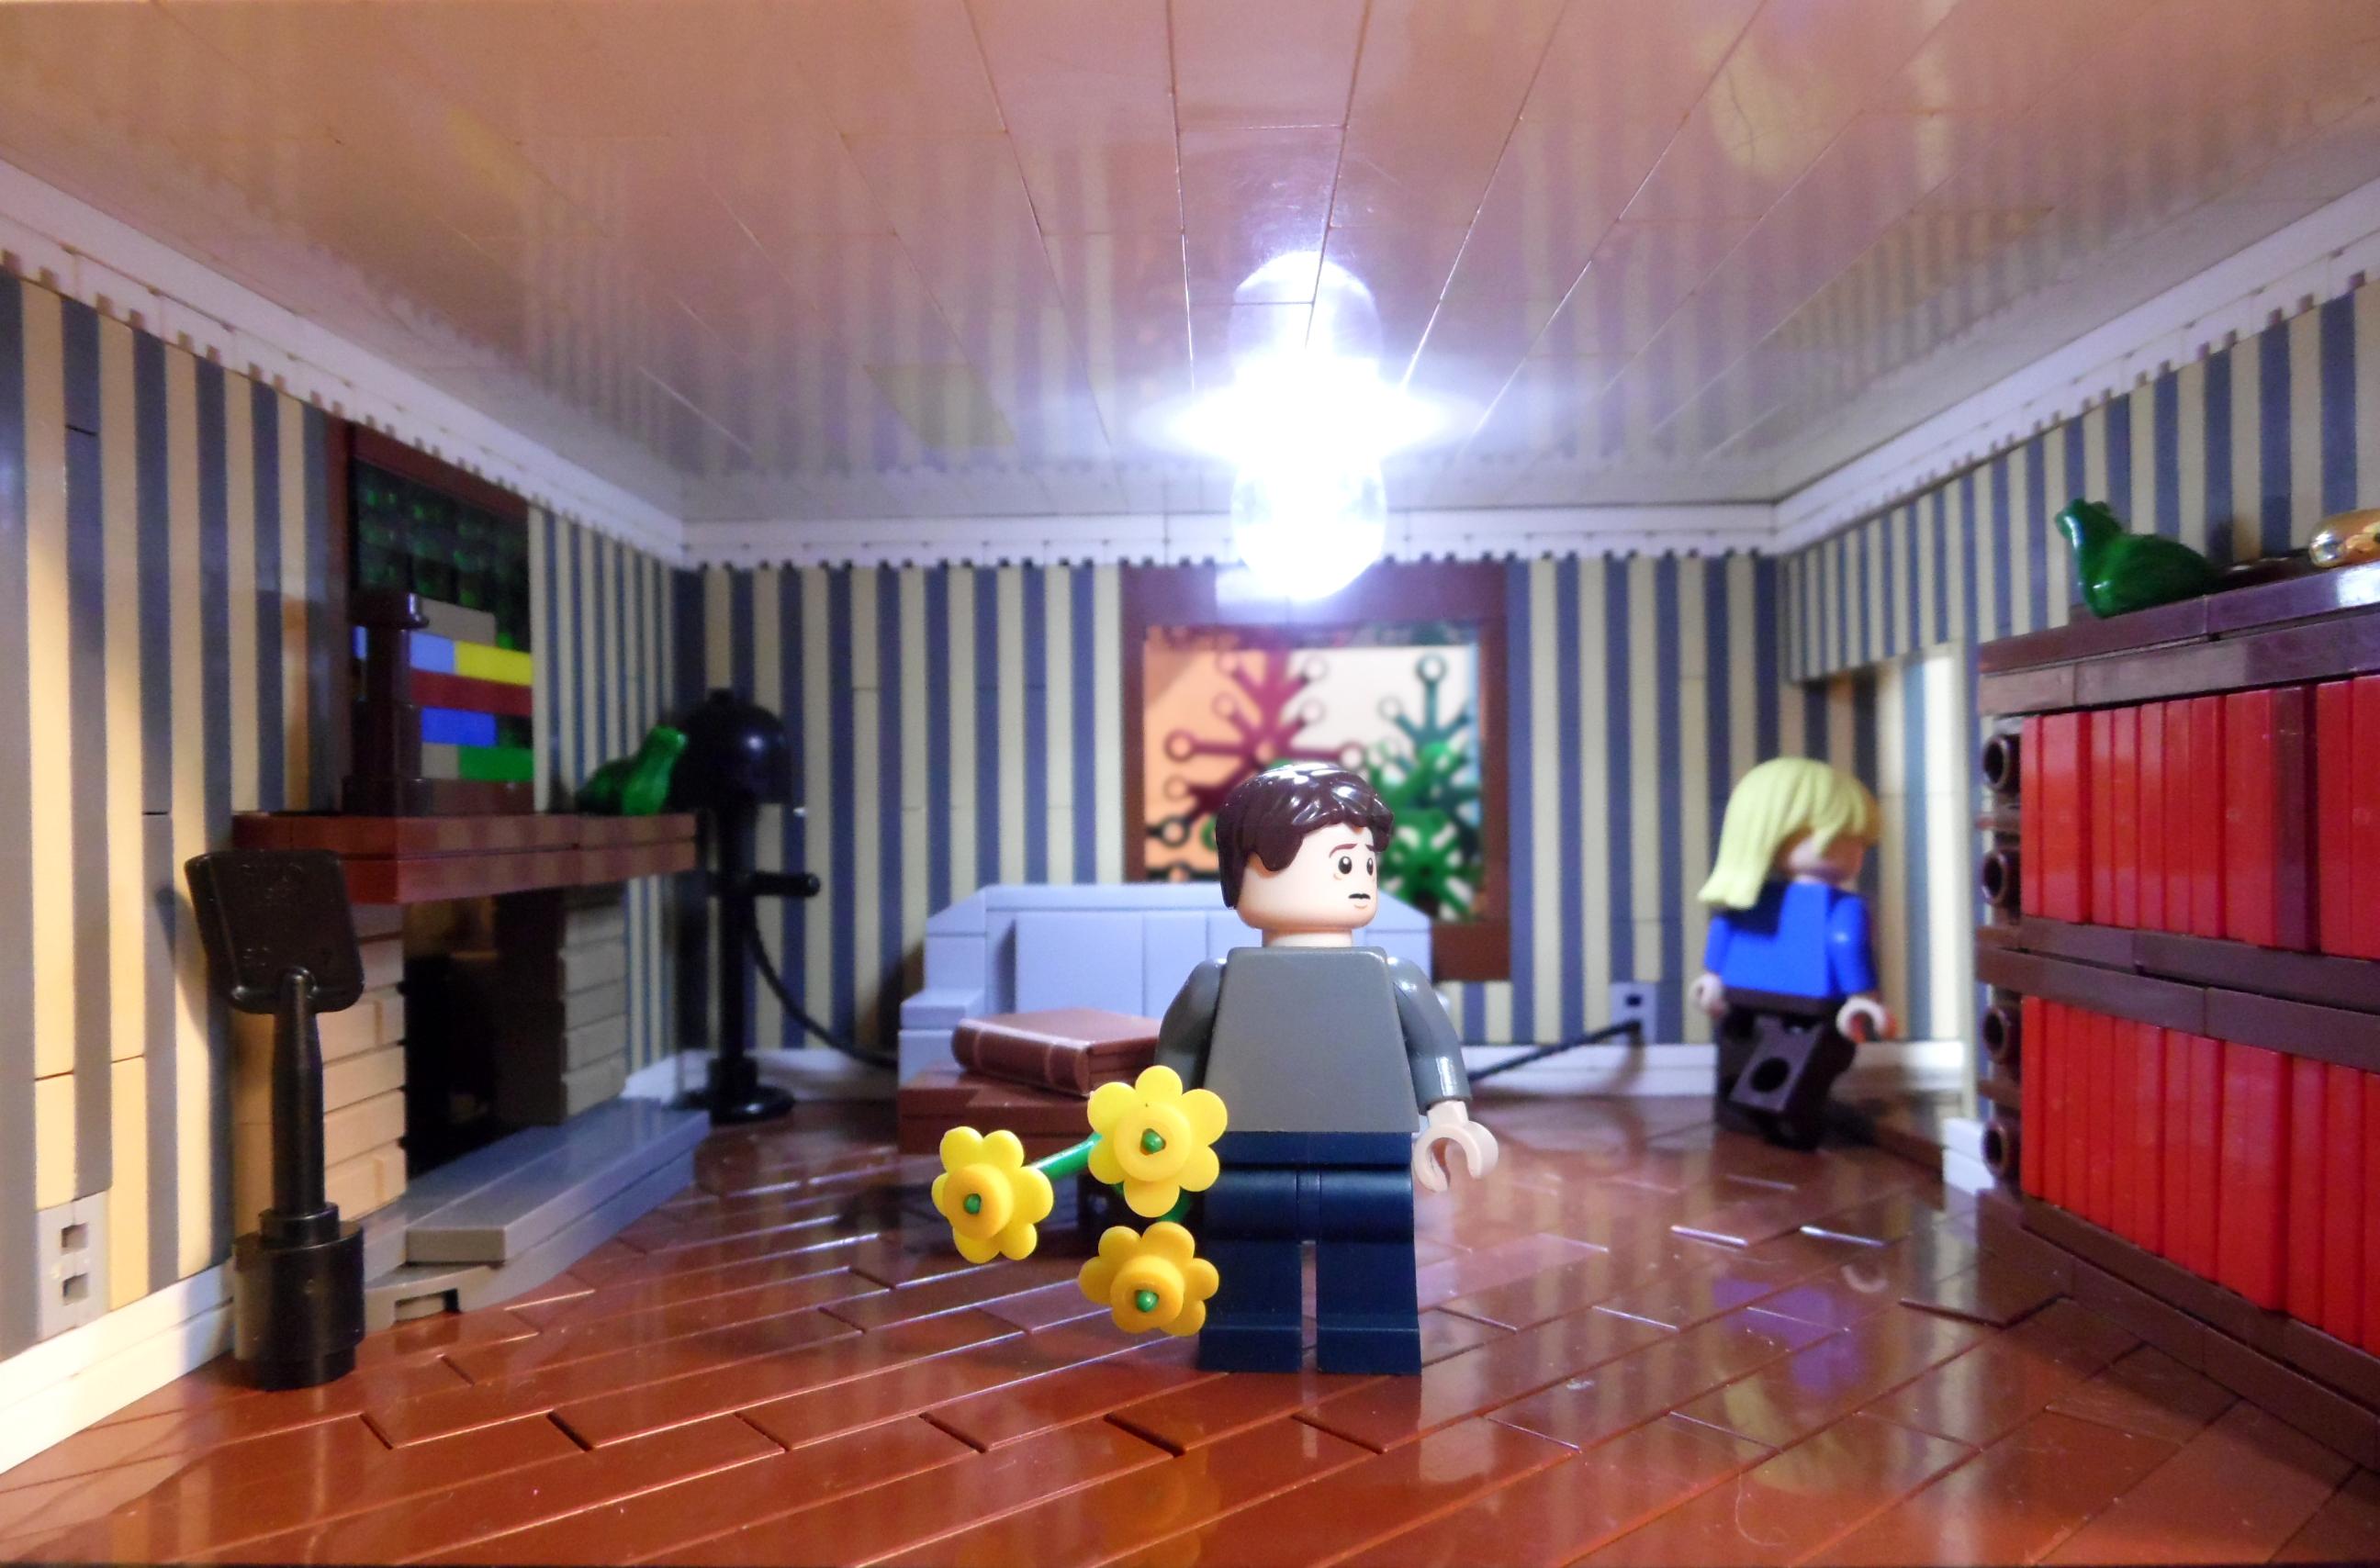 Wallpaper : , bricks, house, LEGO, interior design, ambient ... on microsoft house designer, home designer, lego building,